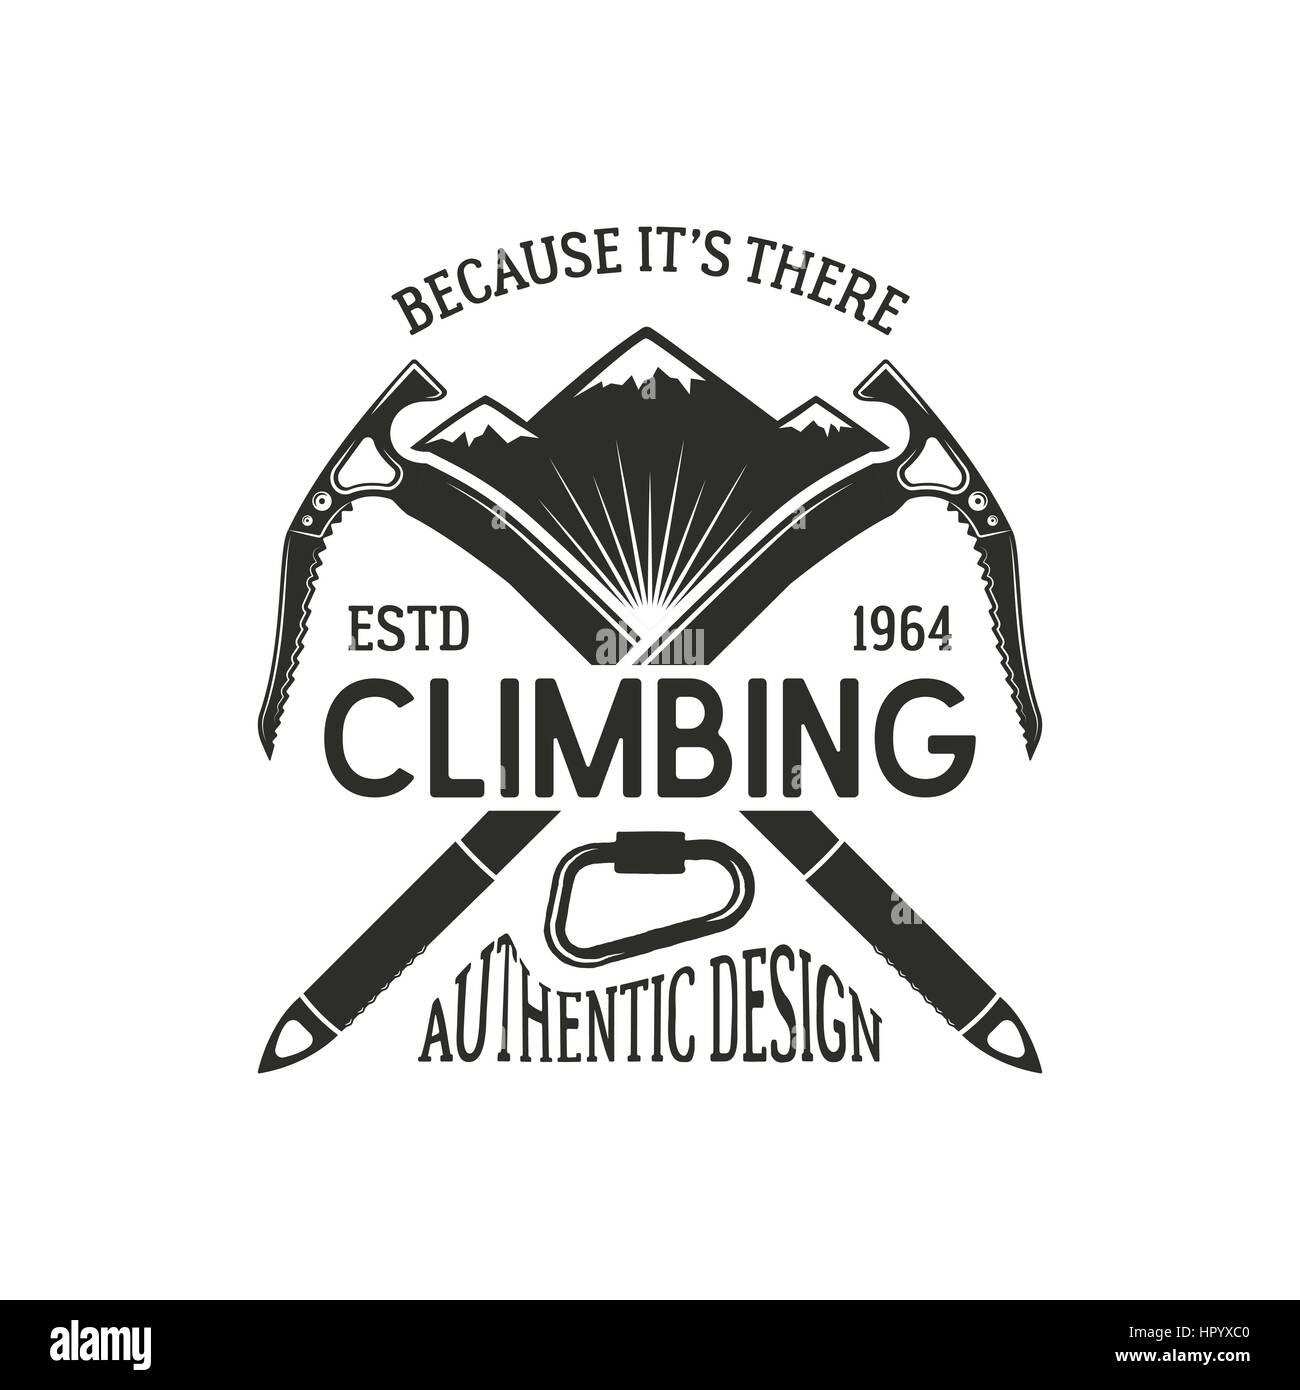 Vintage climbing badge. Climbing logo, vintage vector emblem. Climb gear - carabiner and text. Retro t shirt design. Stock Vector